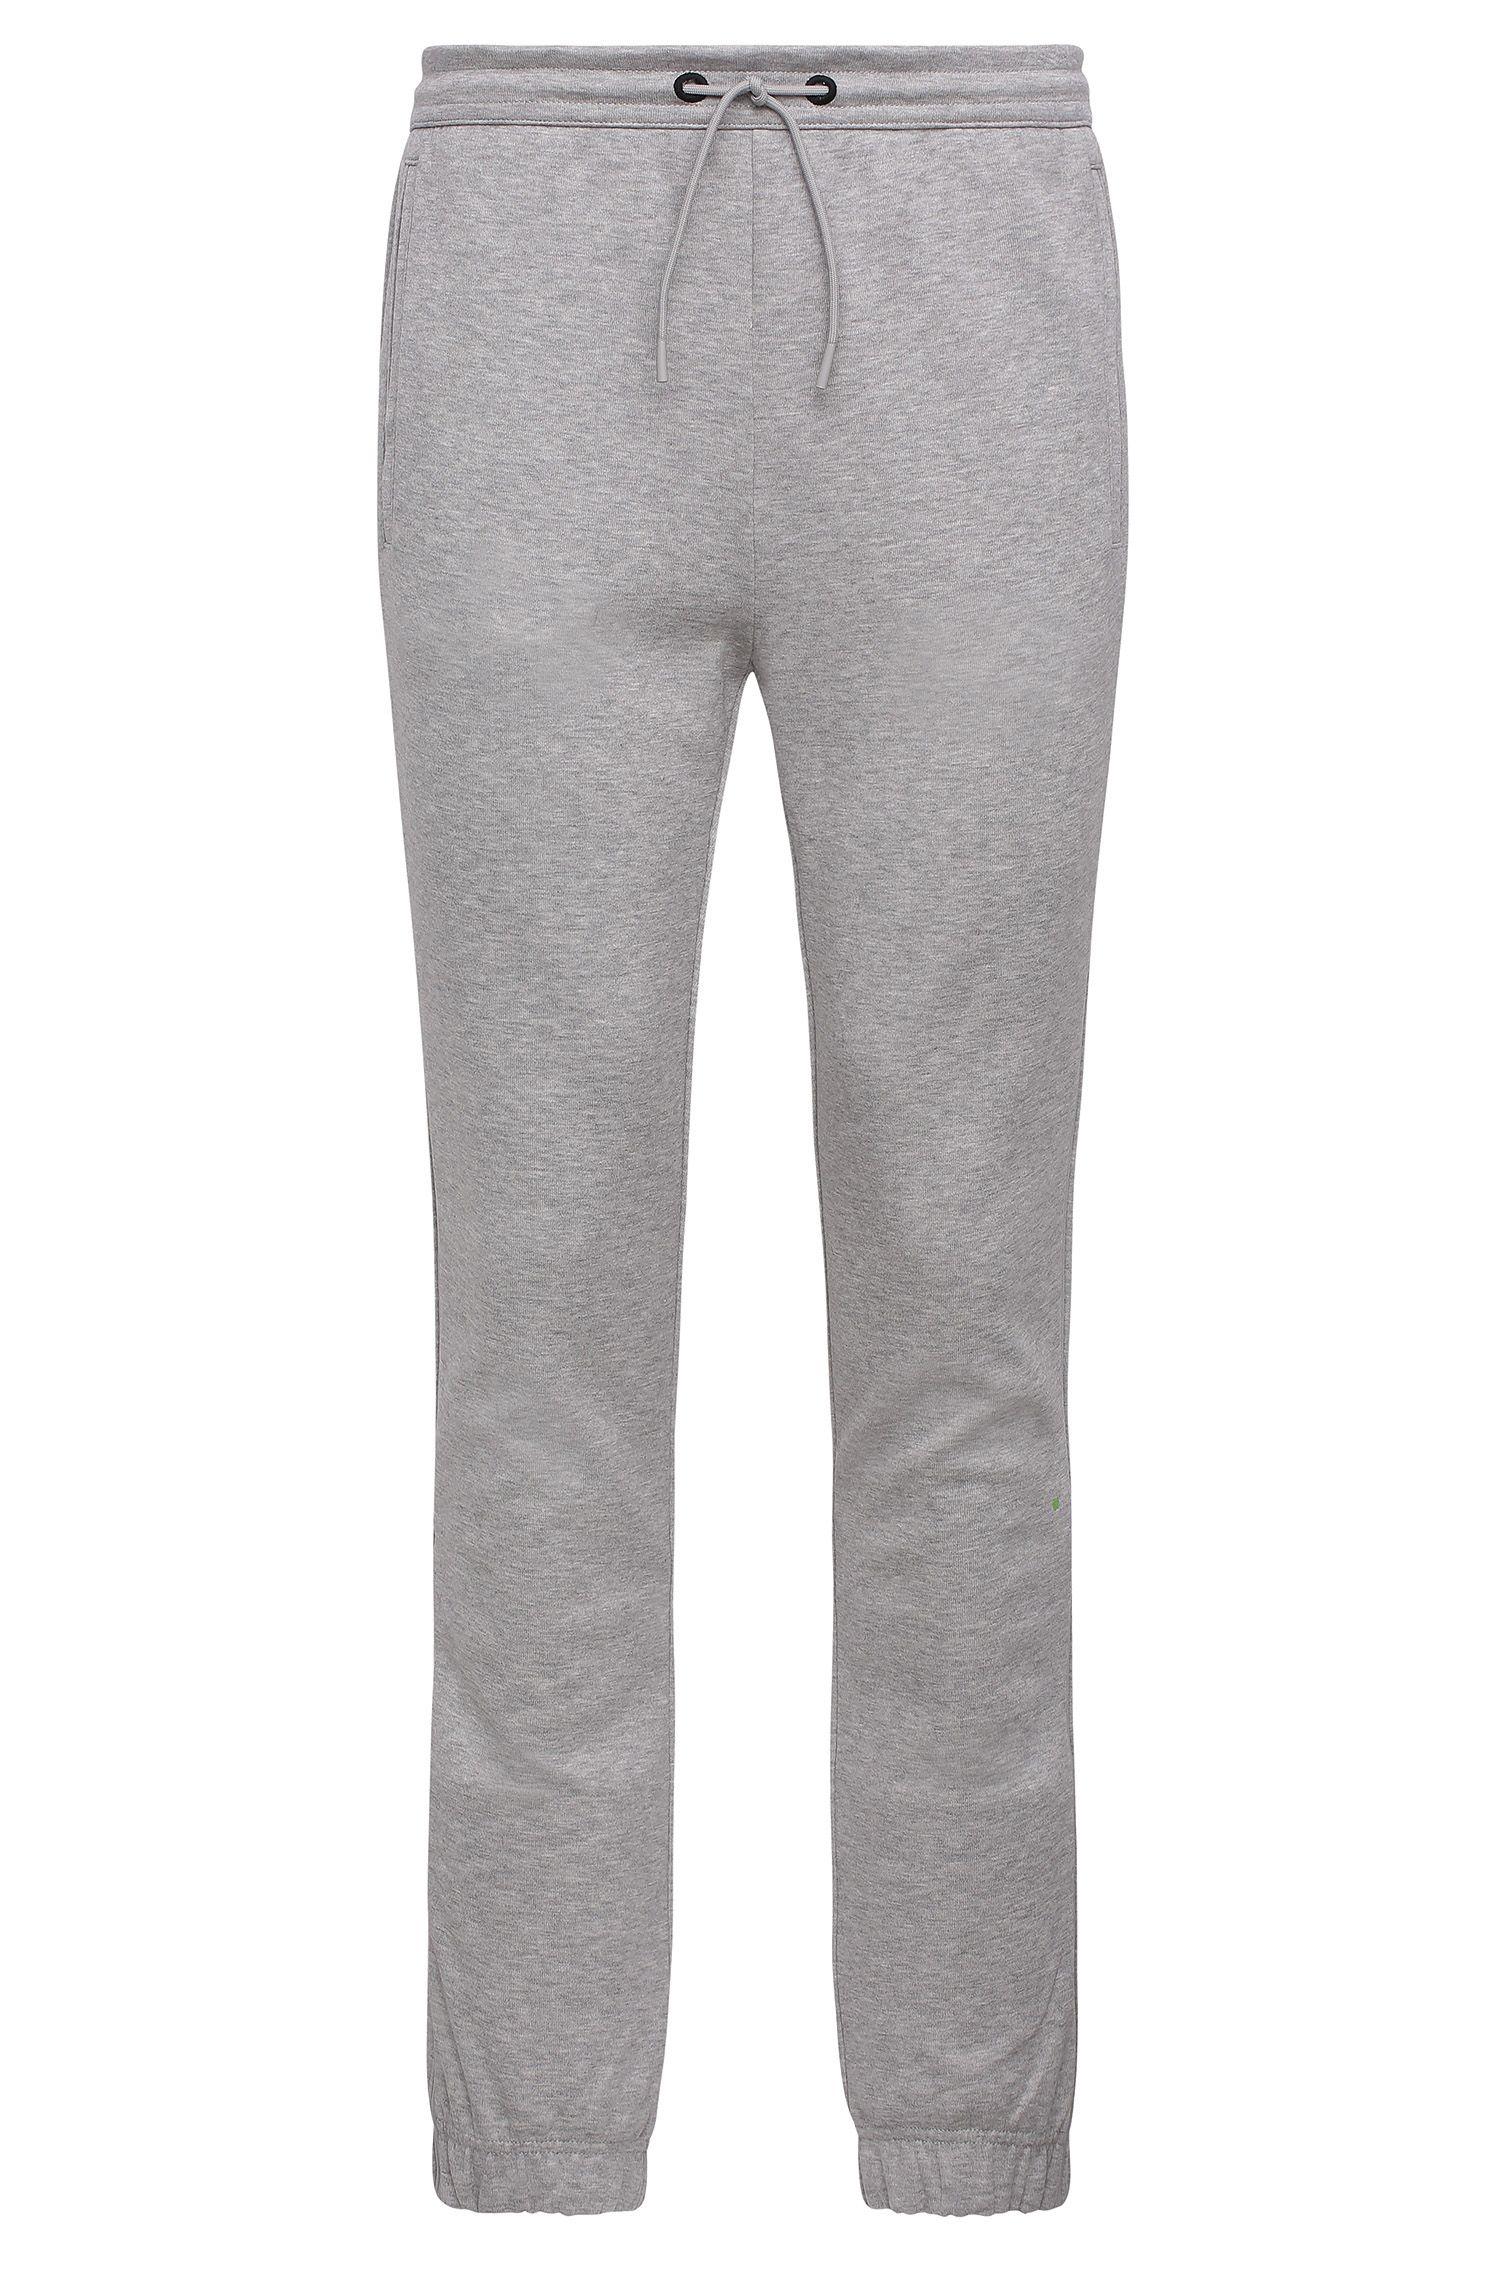 'Hadiko' | Cotton Blend Melange Sweatpants